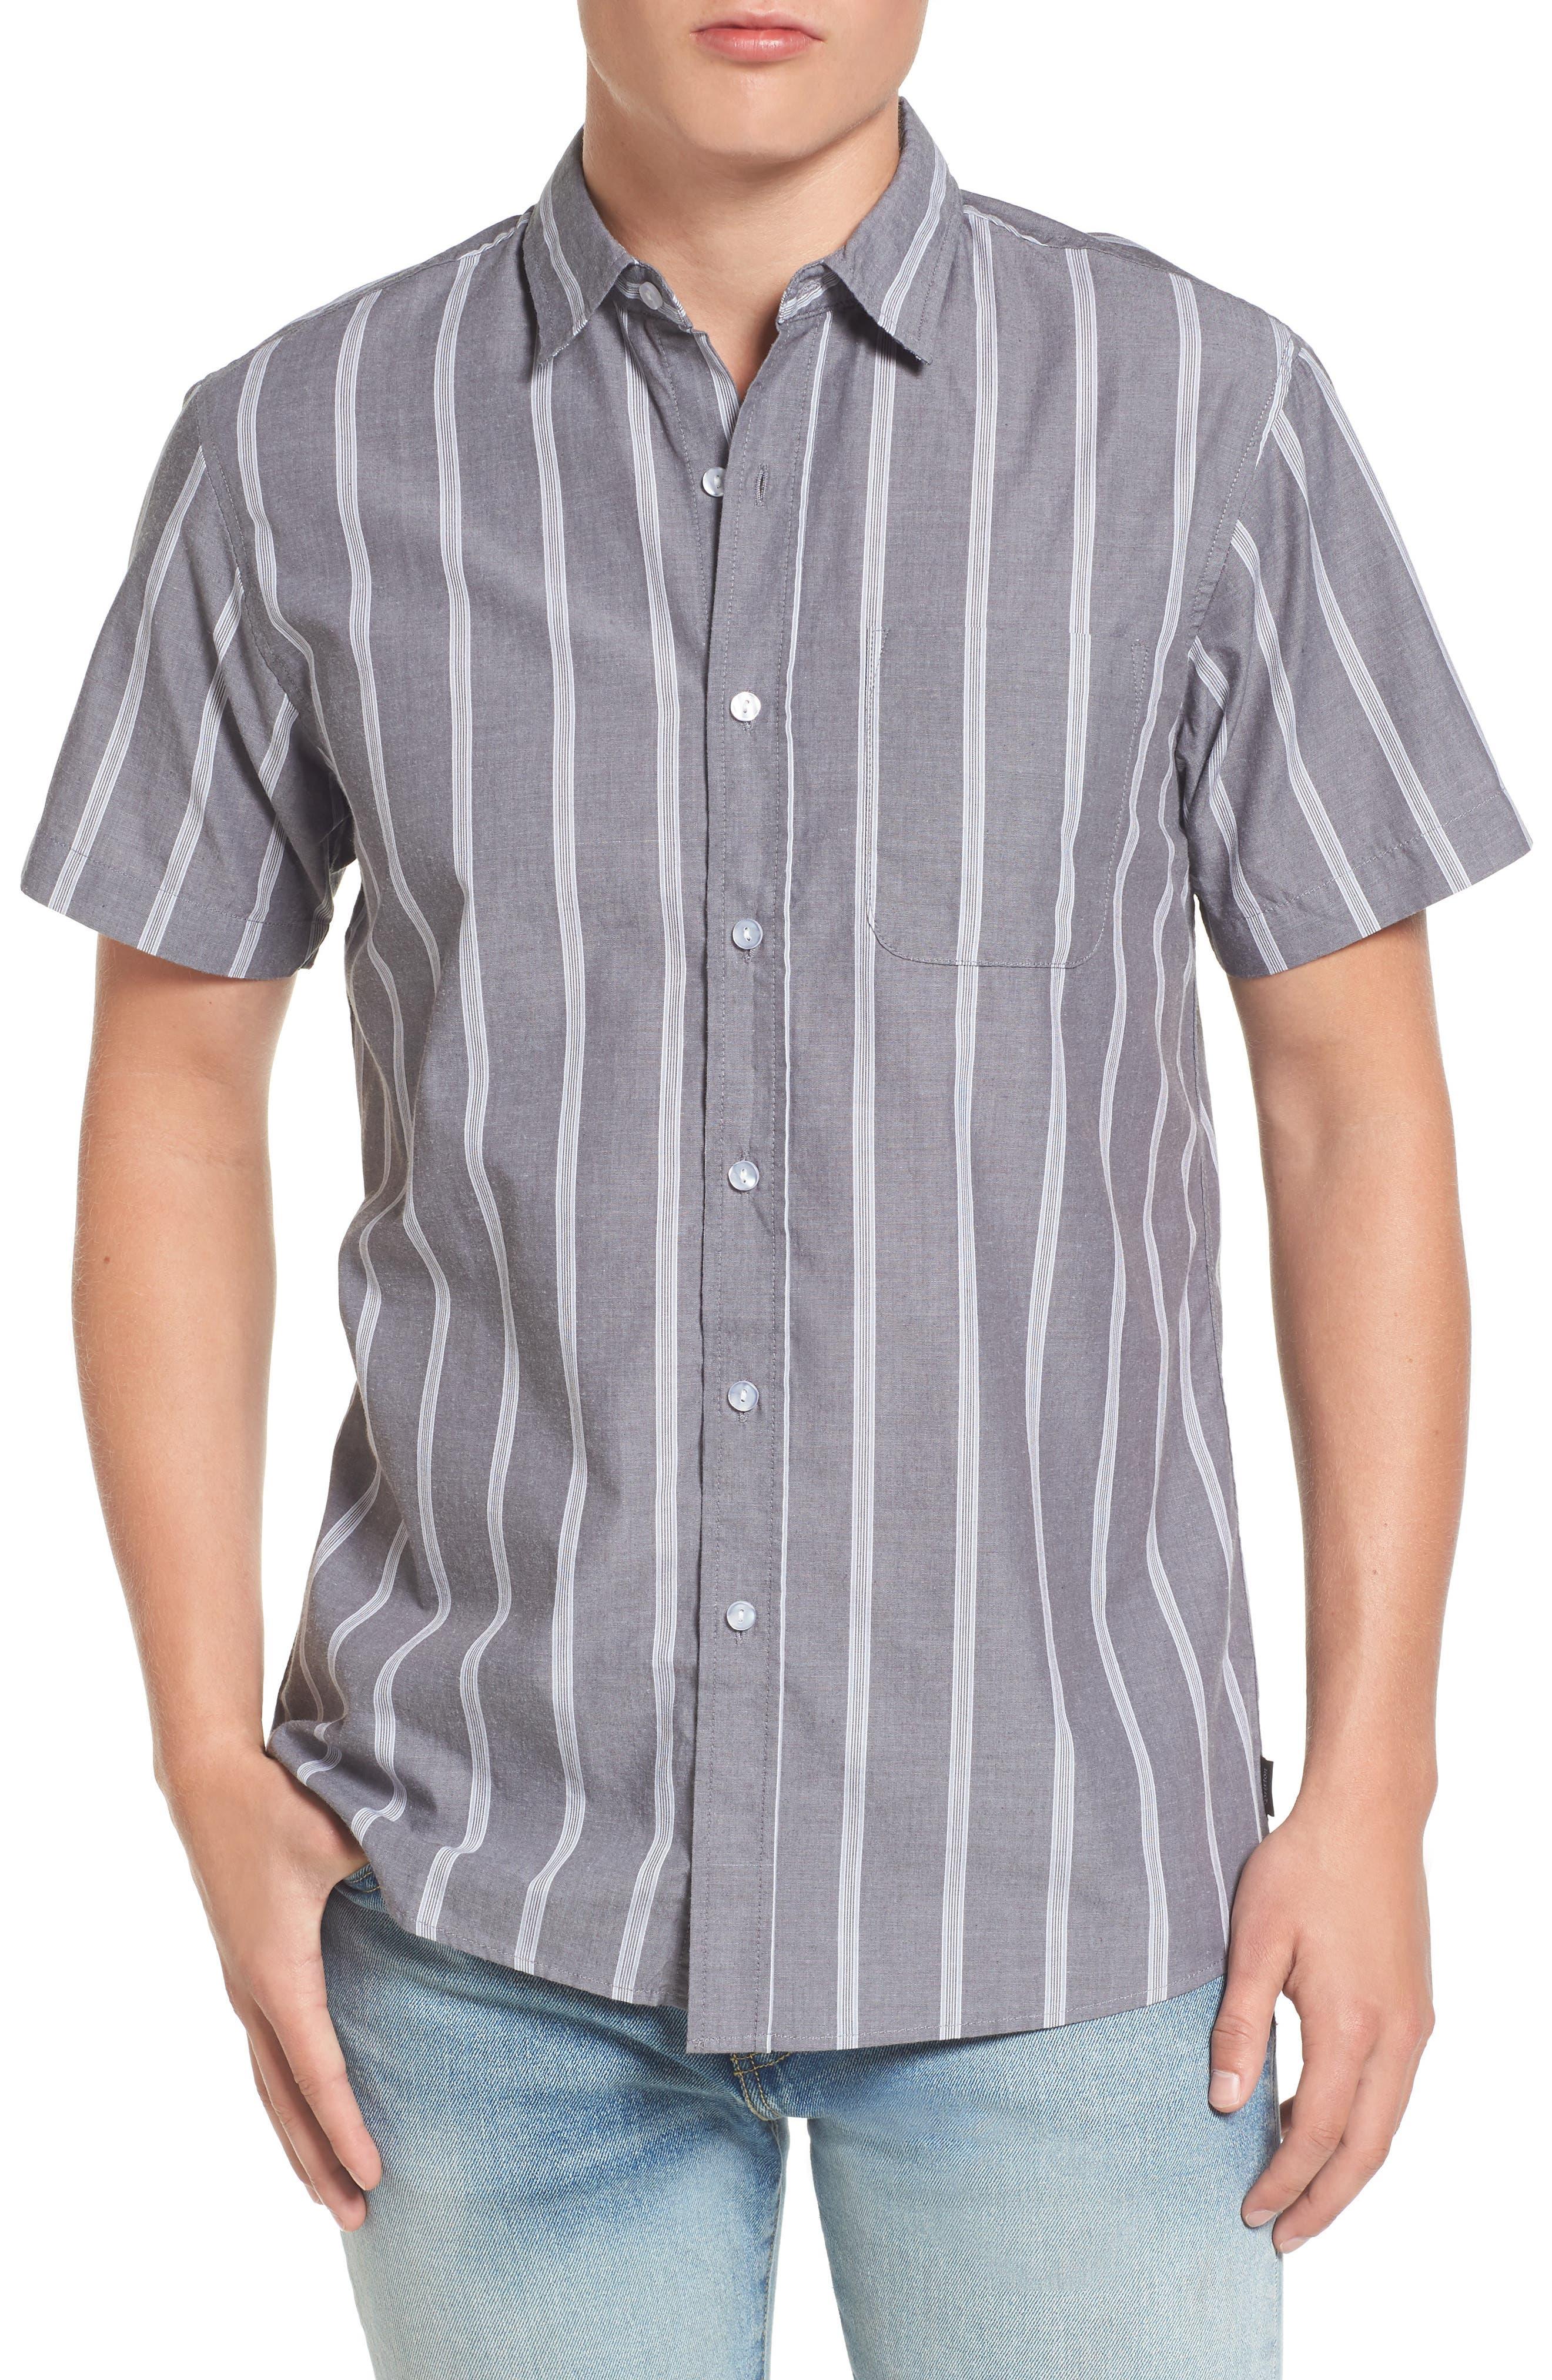 Brixton Decca Stripe Woven Shirt